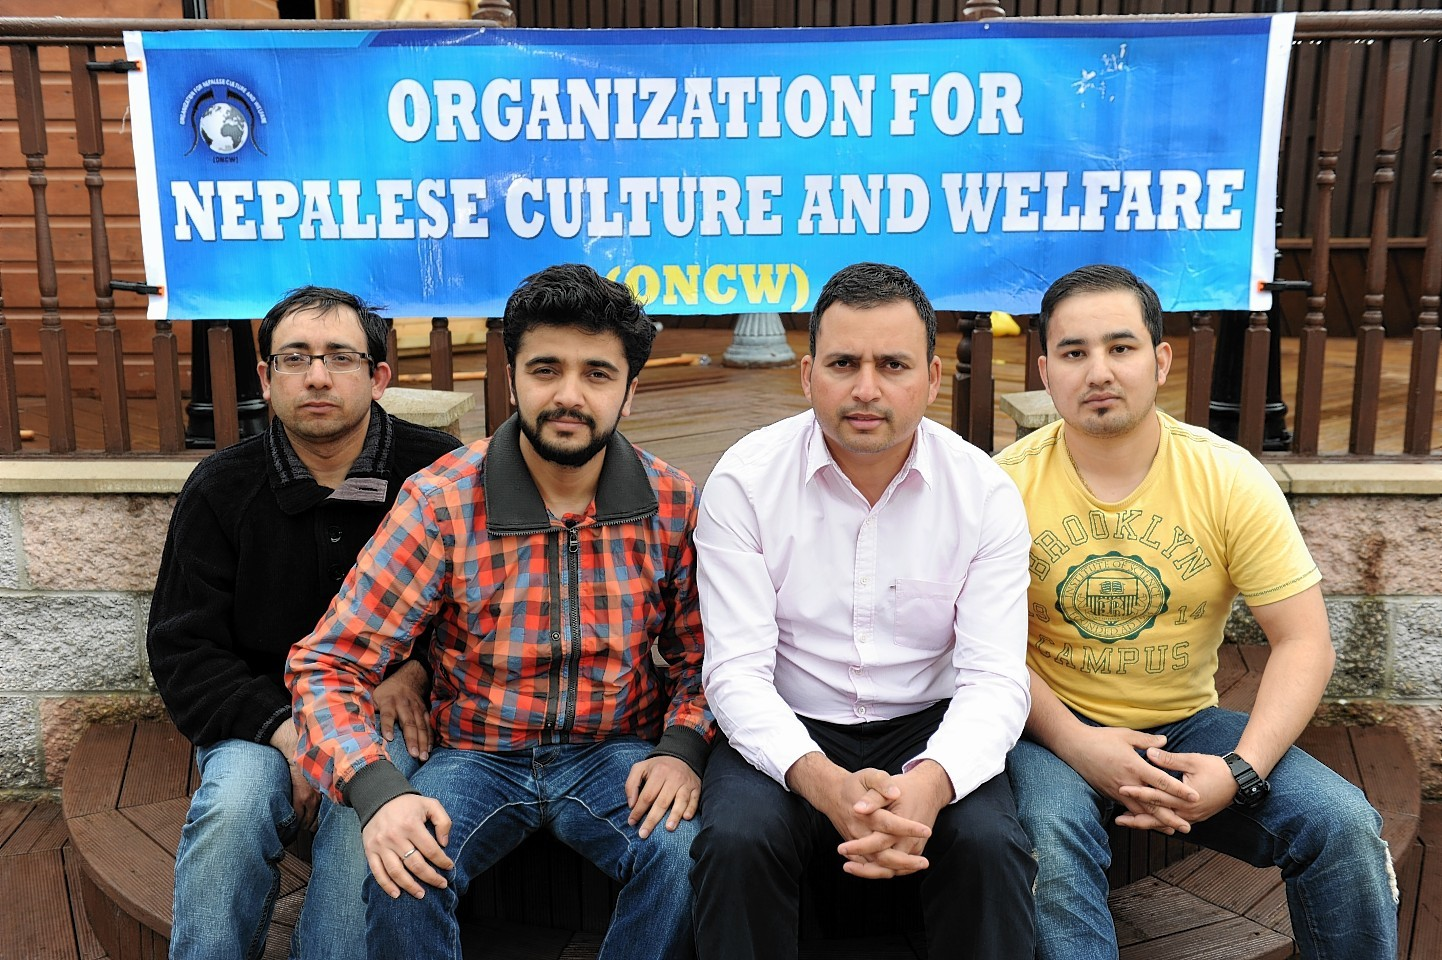 Picture of (L-R) Prakash Aryal, Santosh Gaihre, Dipesh Regmi and Nishchal Karki.  Picture by KENNY ELRICK